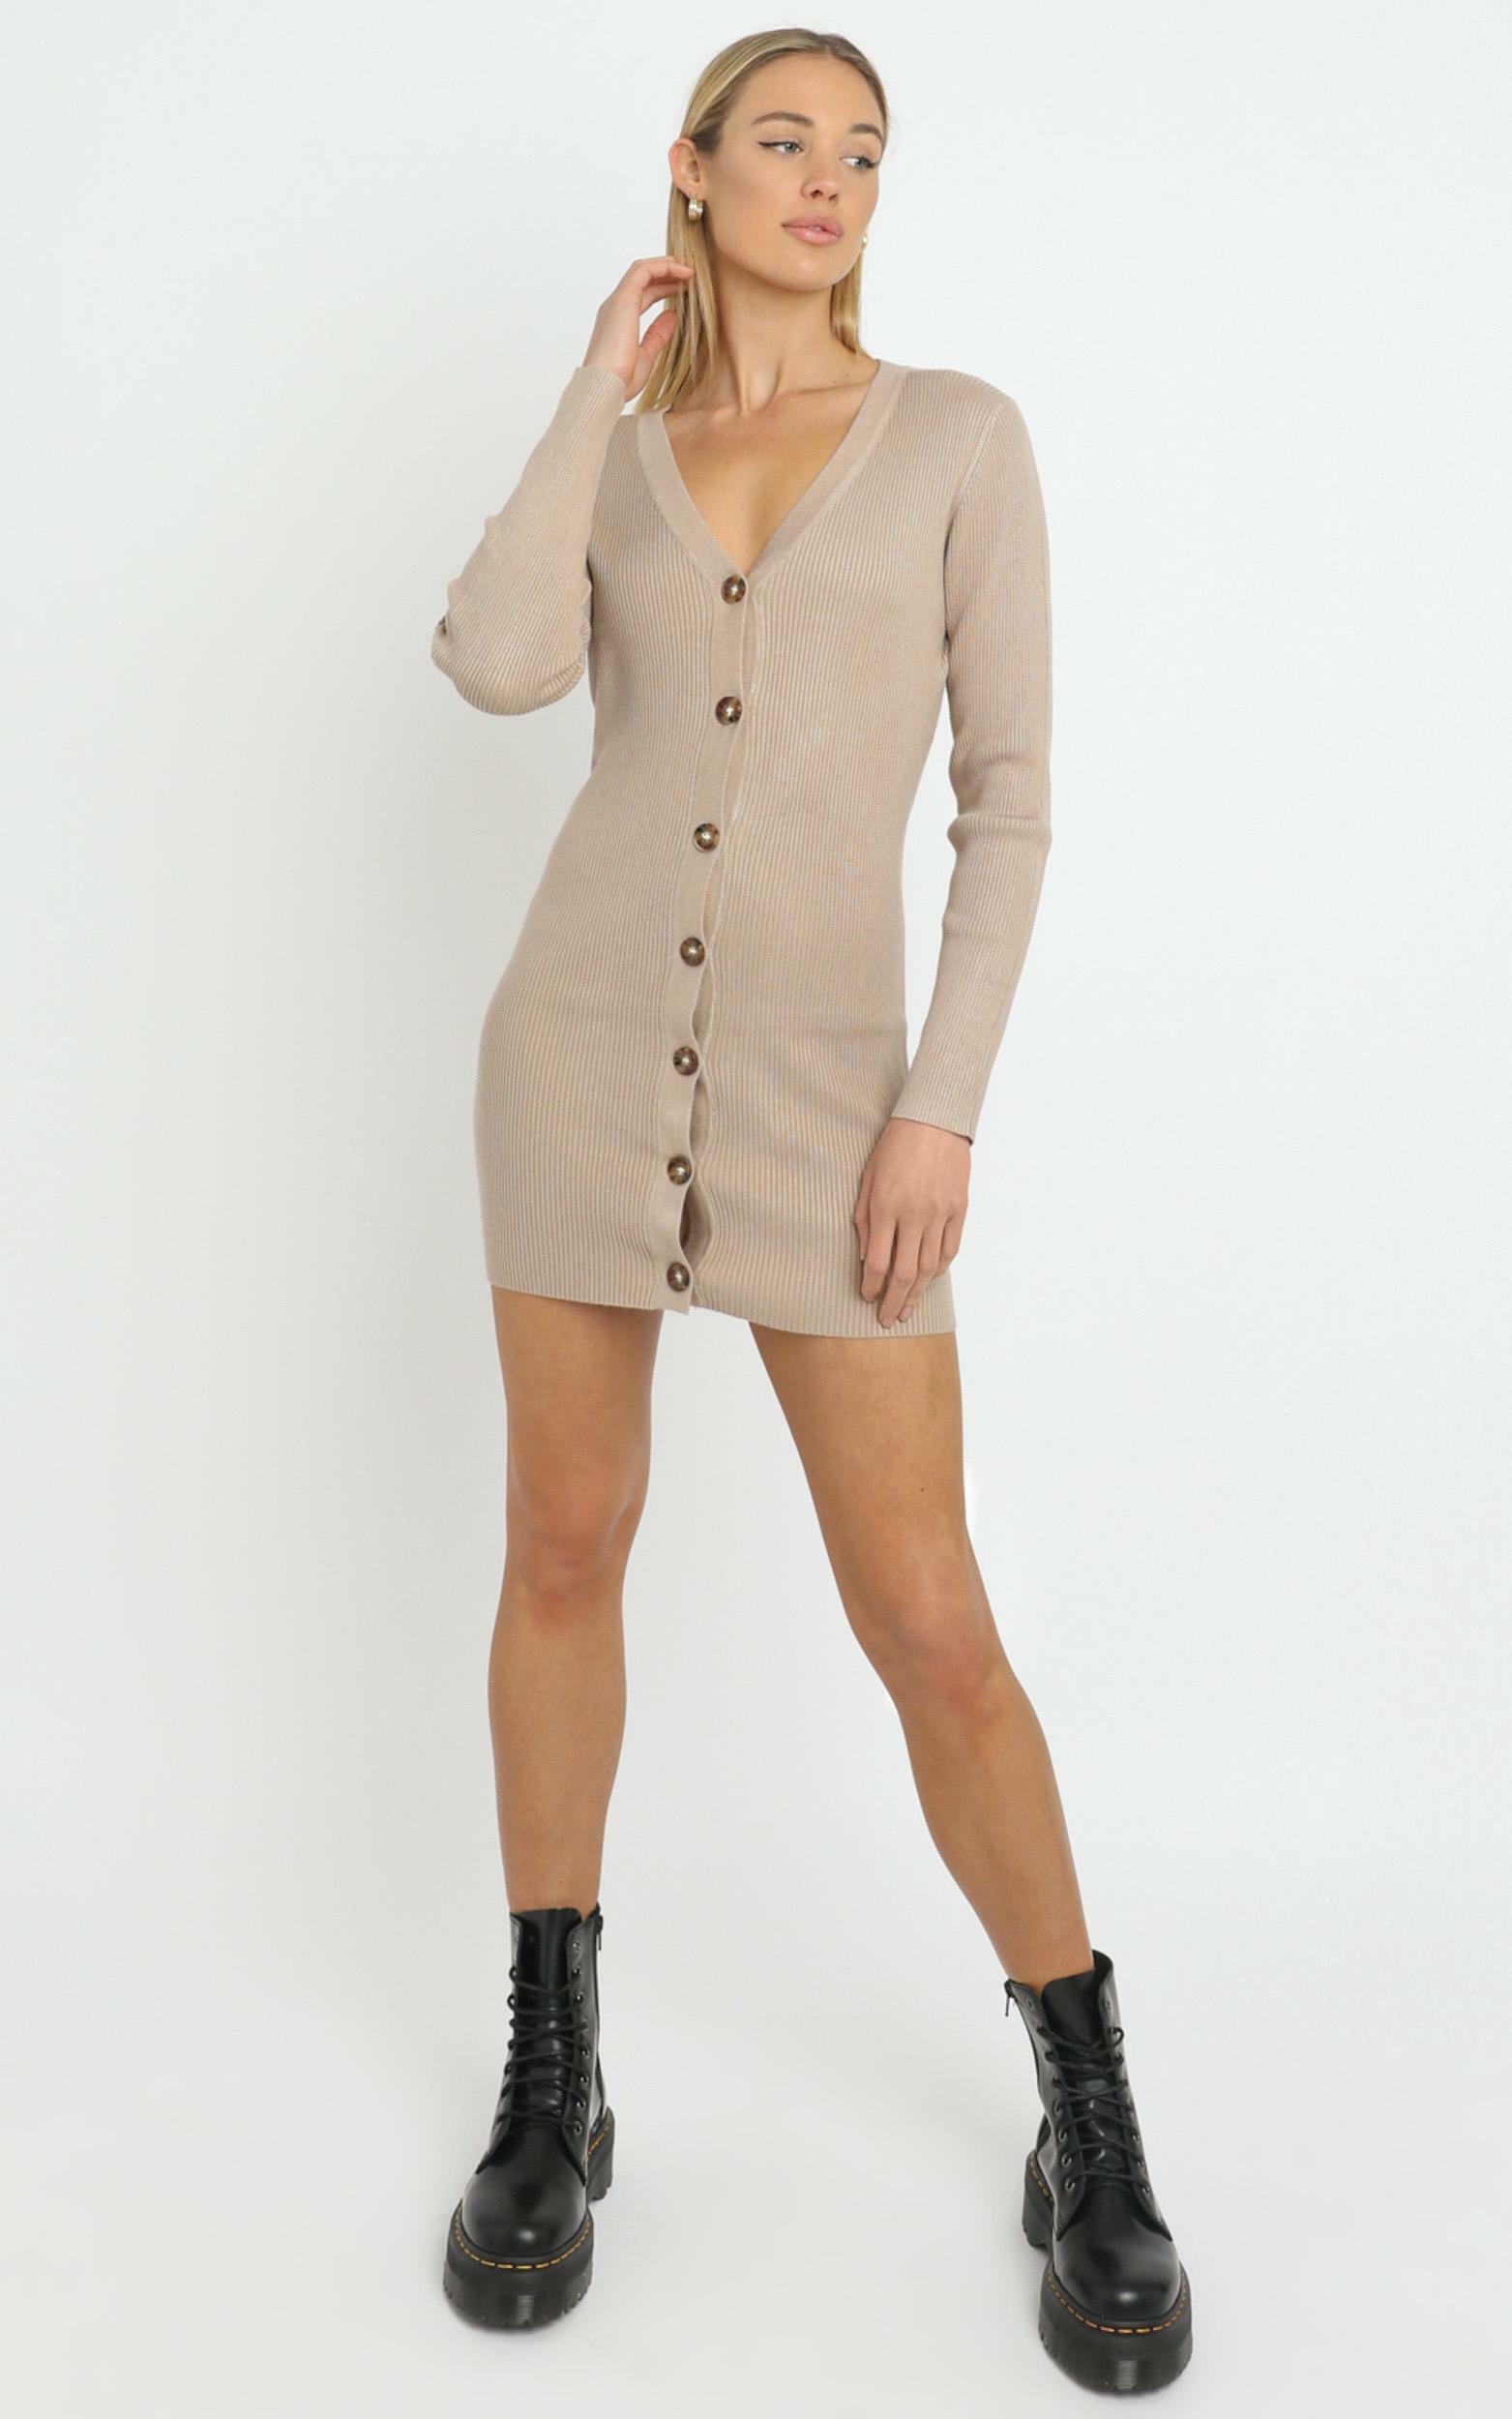 Earie Dress in Beige - M/L, Beige, hi-res image number null